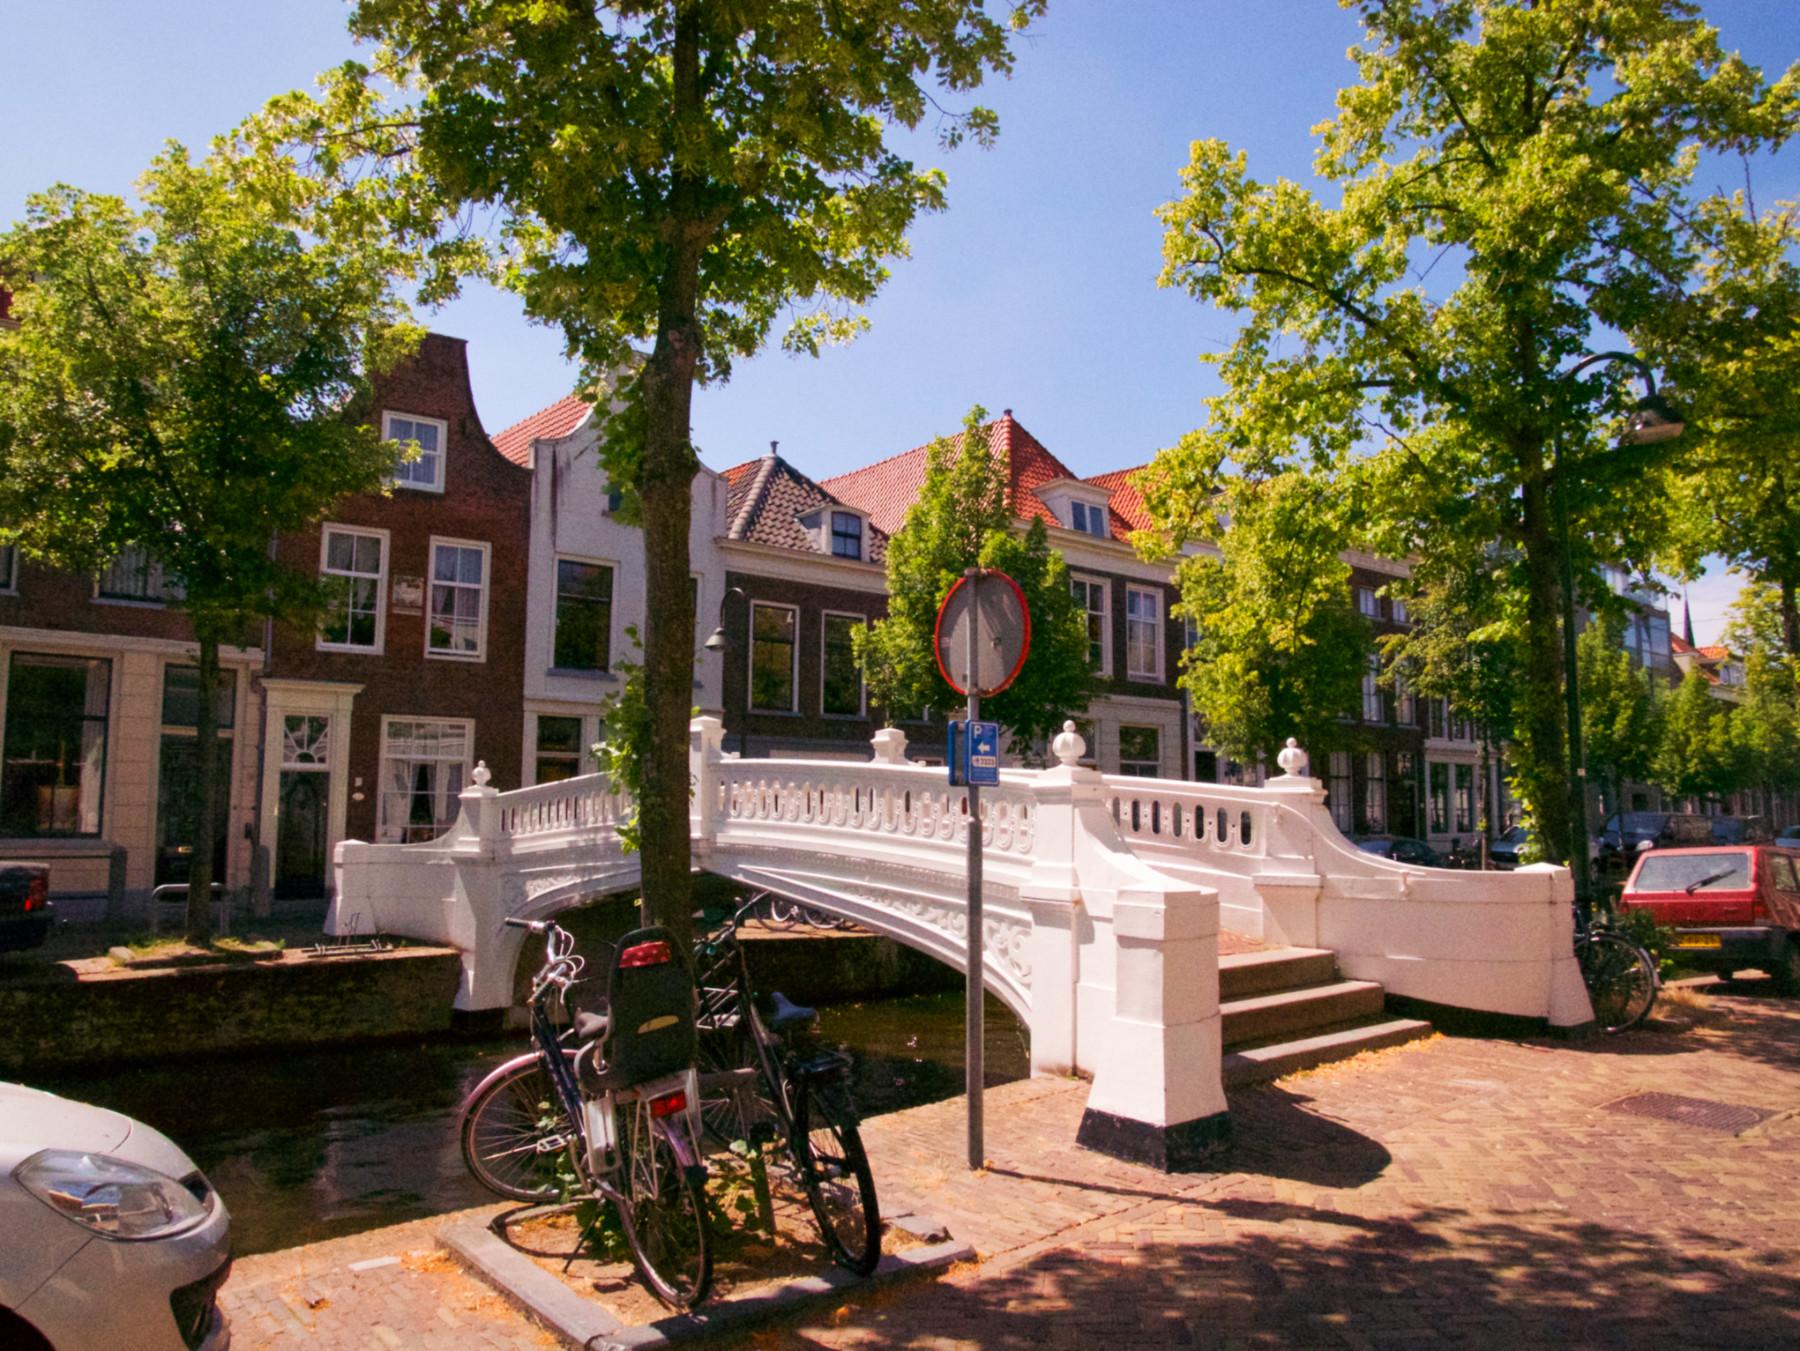 073-Nederland-Delft